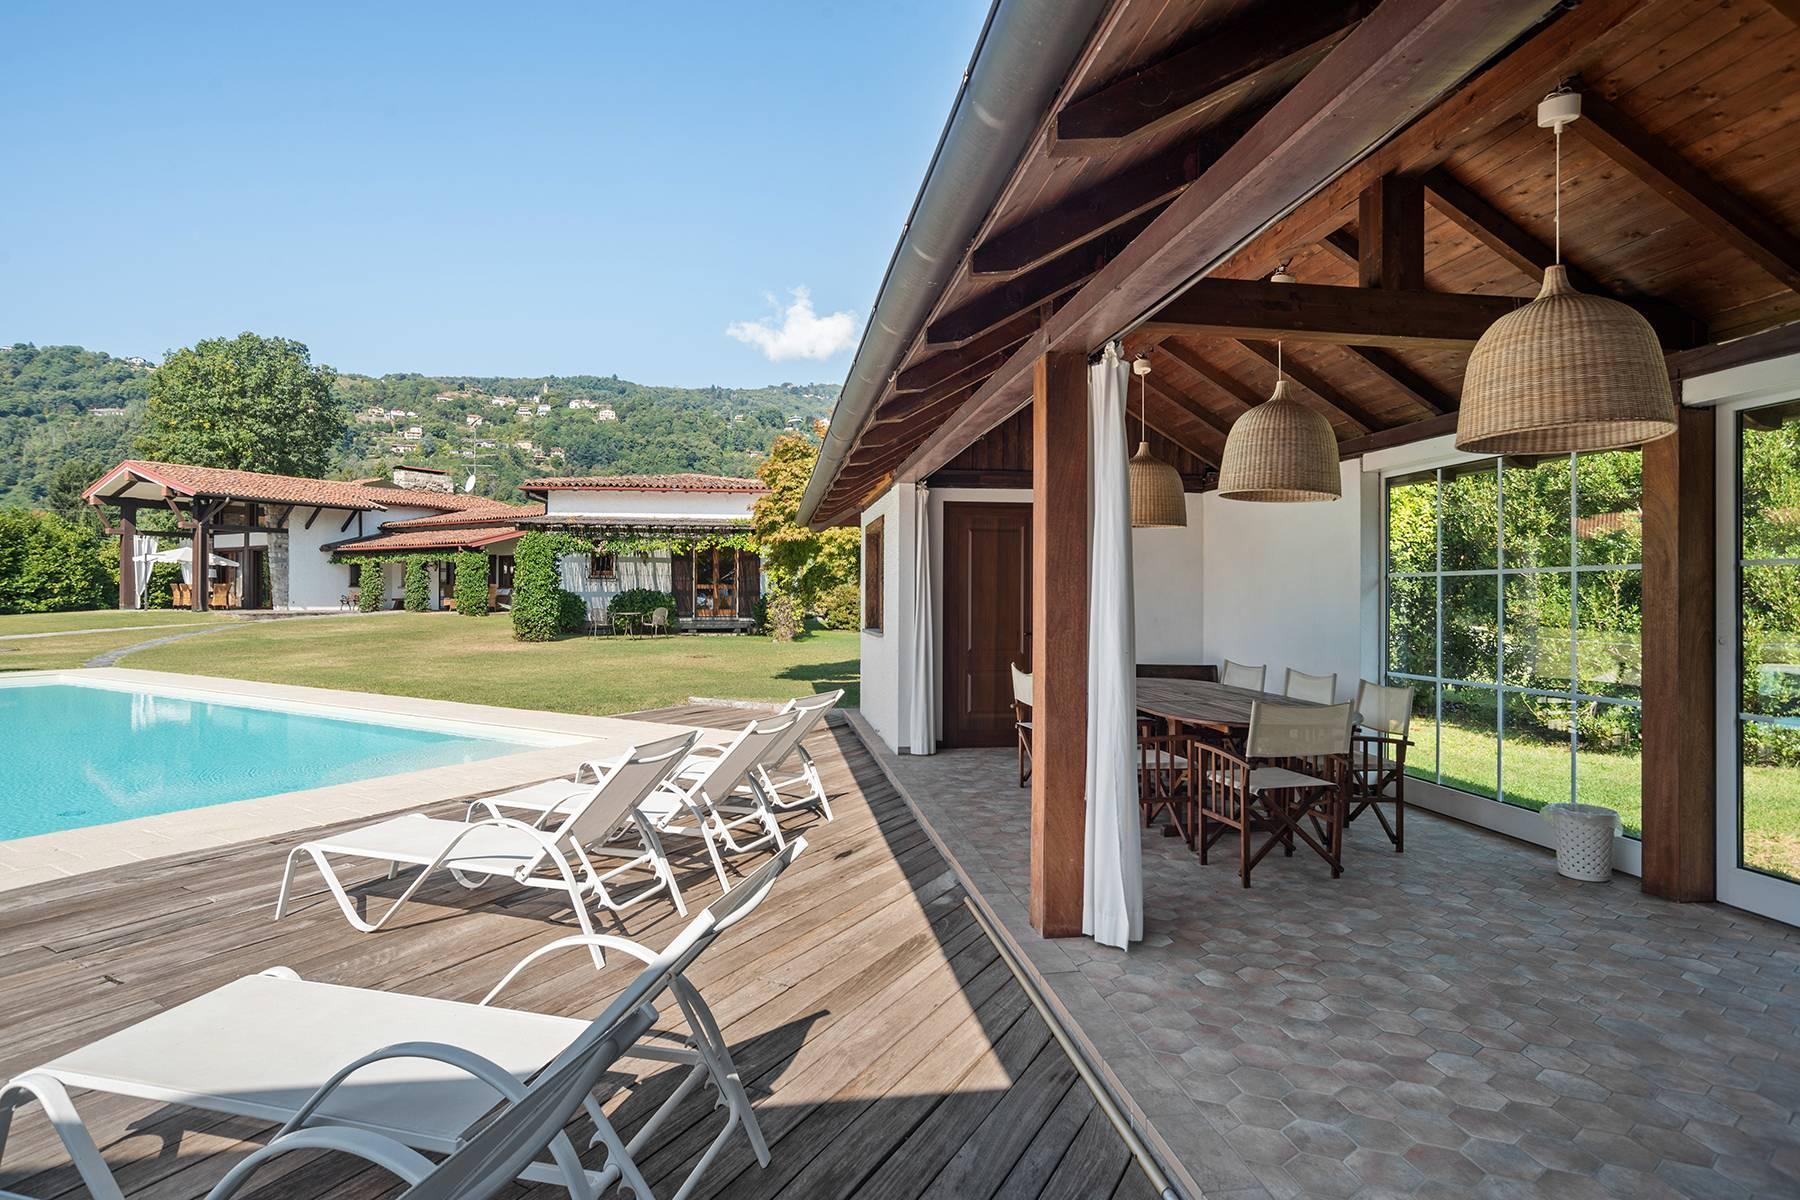 Charmante Villa in Lesa, mitten in der Natur - 13